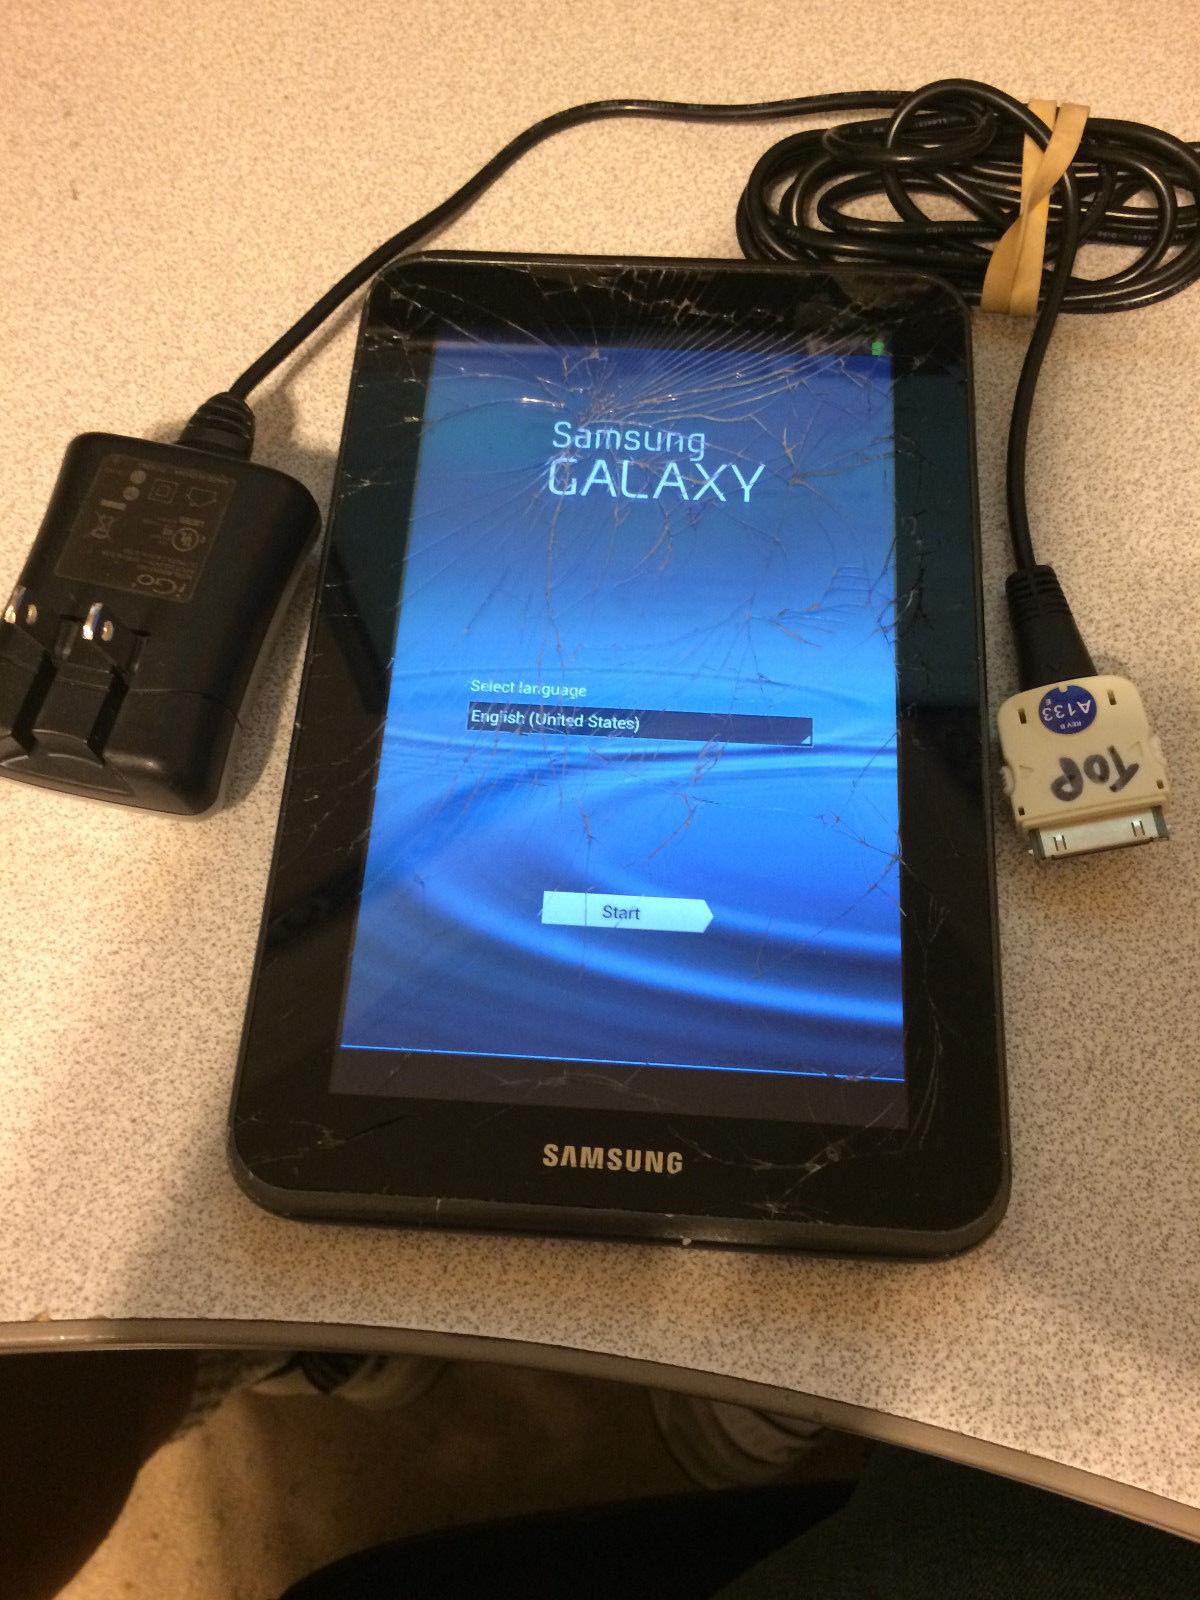 Samsung Galaxy Tab 2 GT-P3113TS 8GB Wi-Fi  7in. Silver Cracked Screen, Works